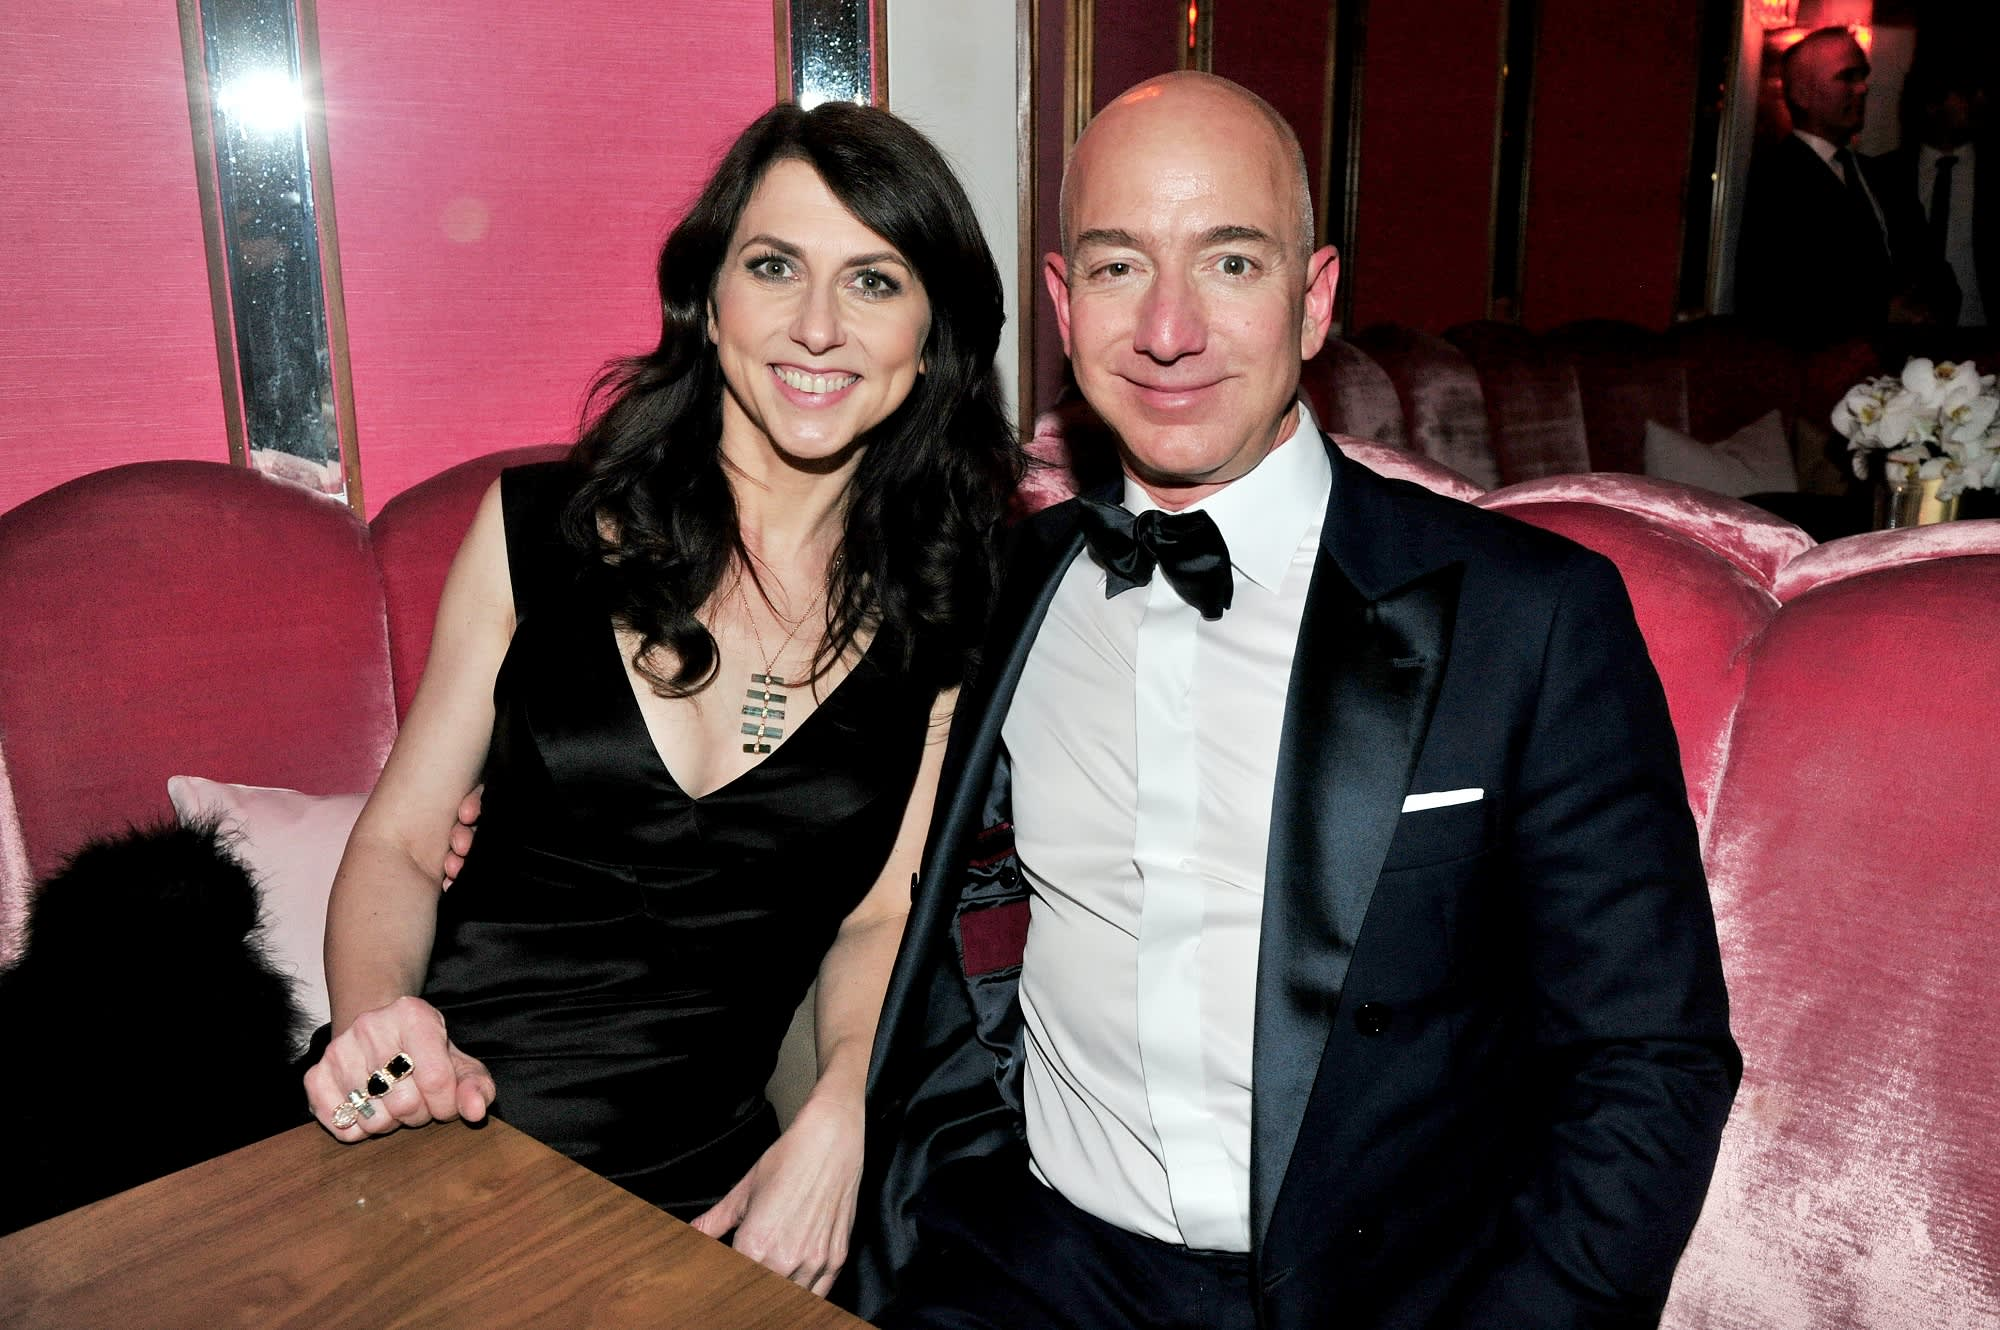 Bezos divorce: Possible impact on Amazon shareholders